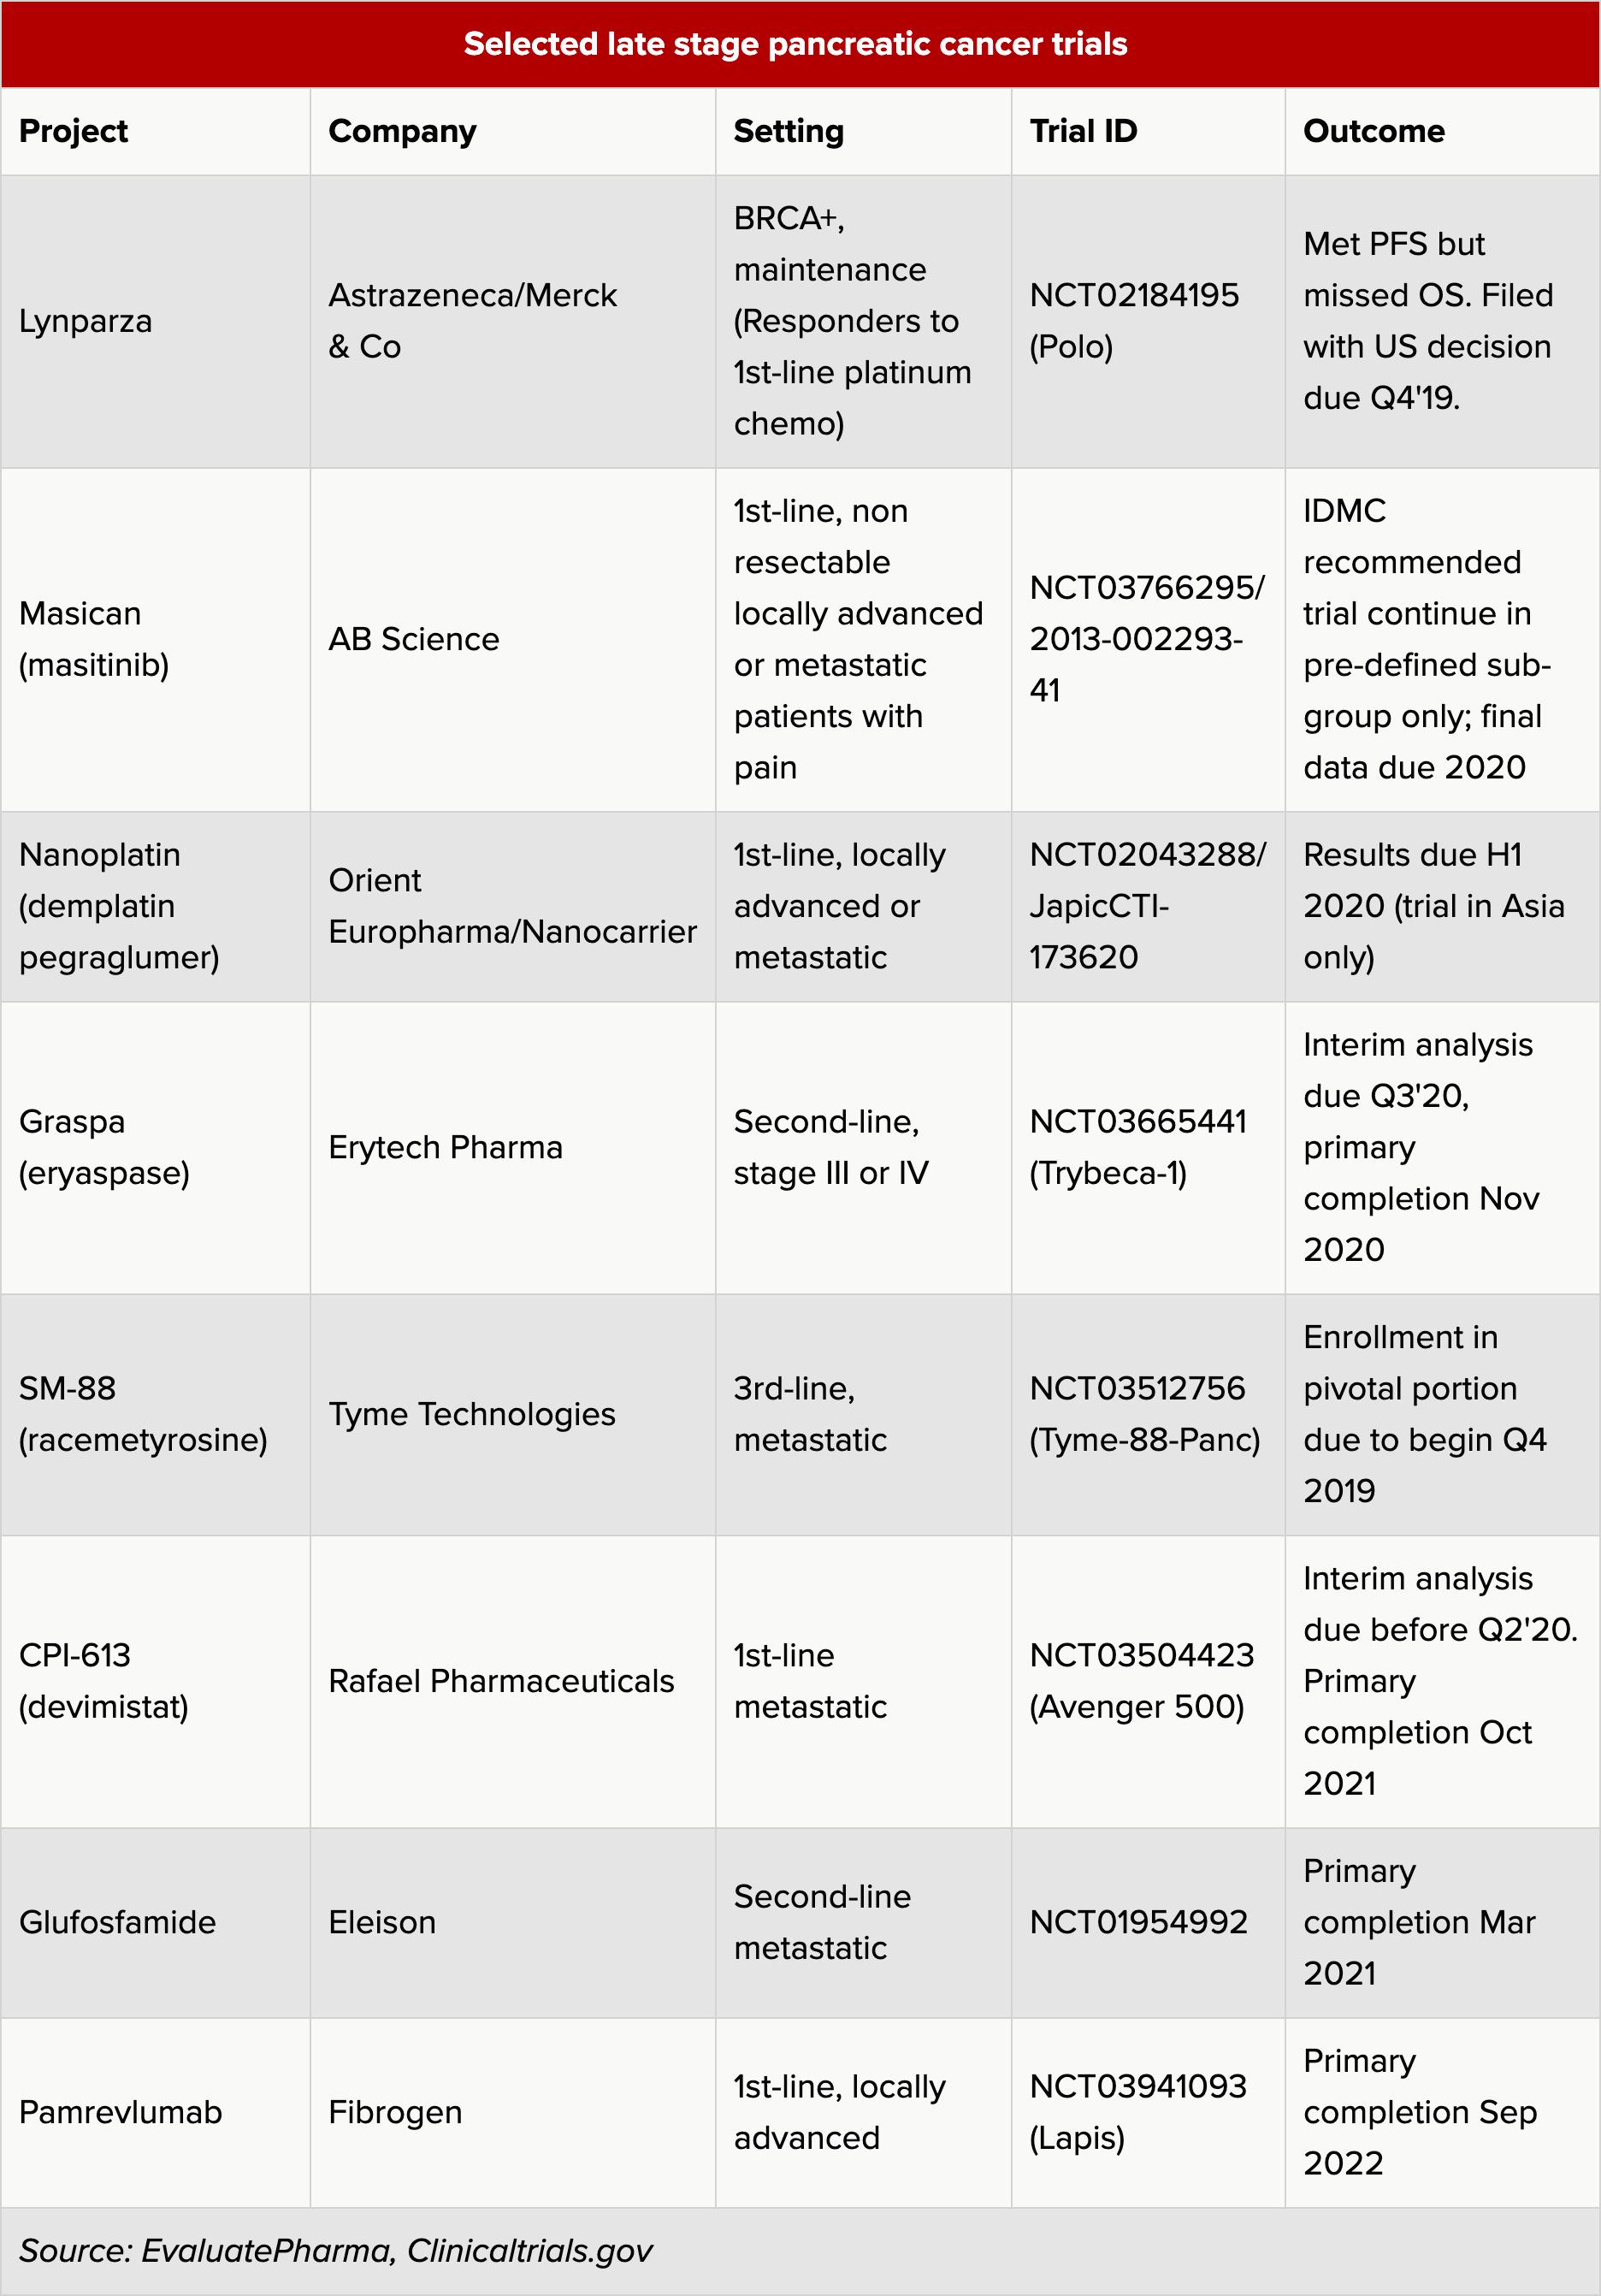 selected late stage pancreatic cancer trials - Рак поджелудочной железы: очередная безуспешная атака